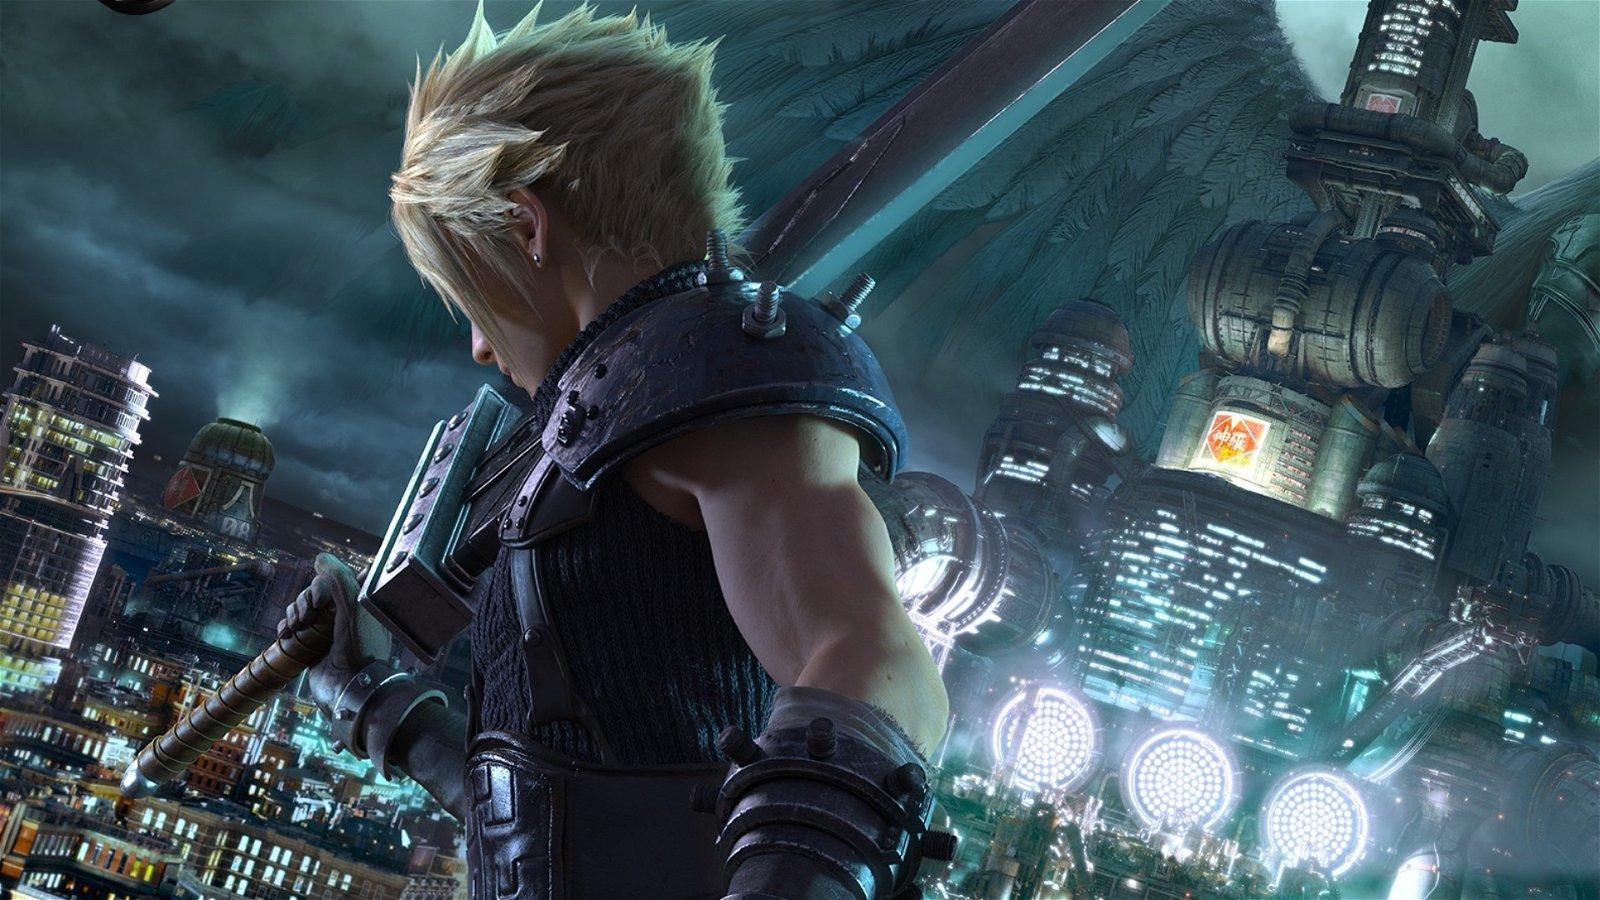 E3 Award Winners Revealed, Final Fantasy VII Wins Best of Show